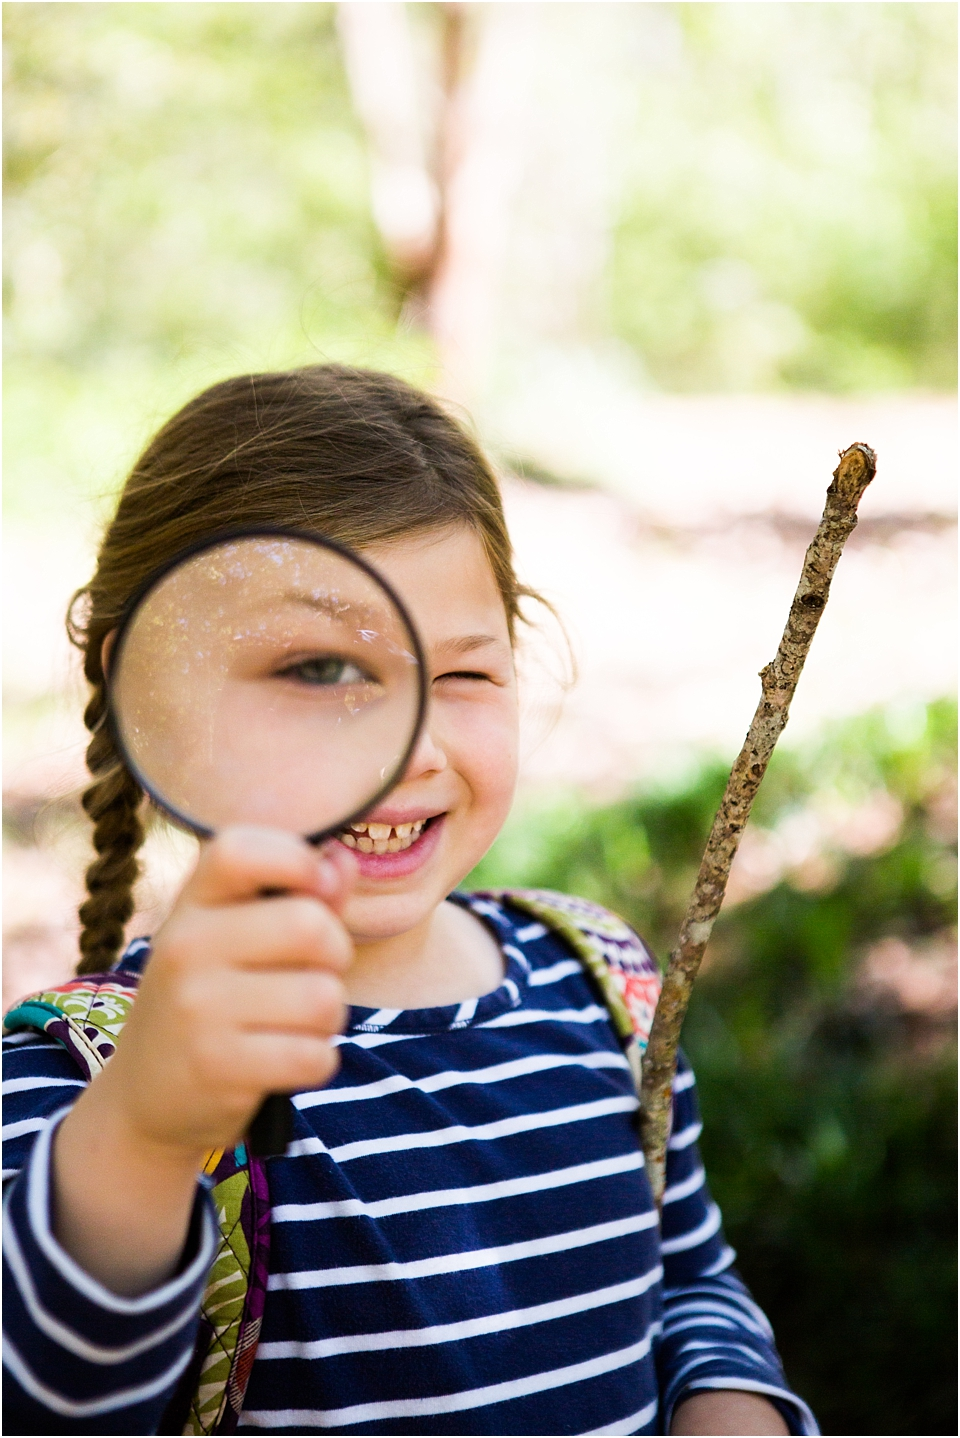 Kids Nature Scavenger Hunt - Free Printable